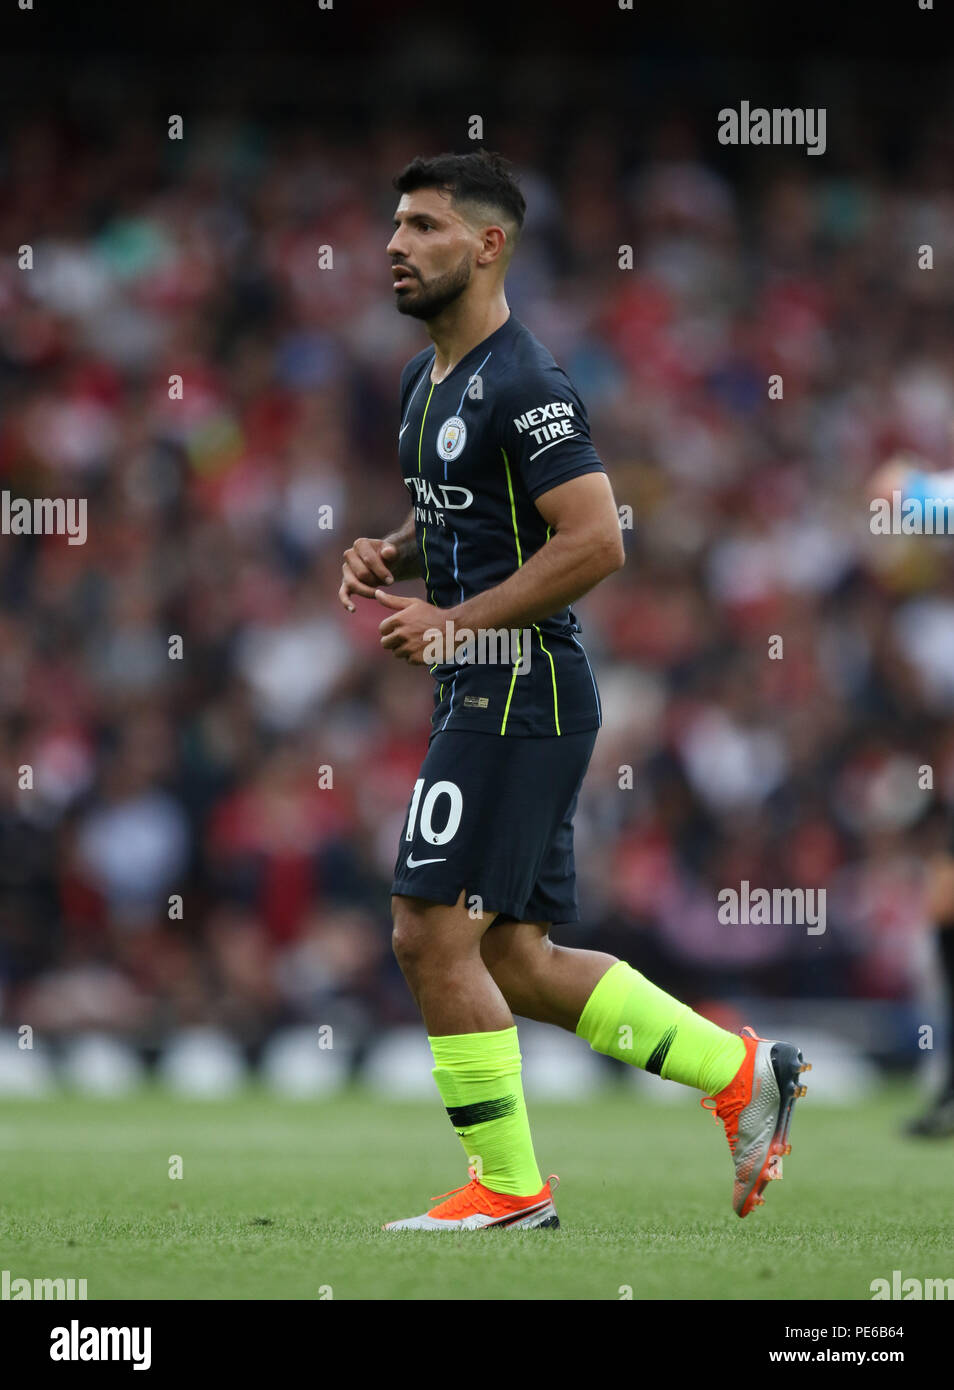 12th Aug 2018. Sergio Aguero (MC) at the Arsenal v Manchester City English  Premier League game at The Emirates Stadium c1fcd84fb1f